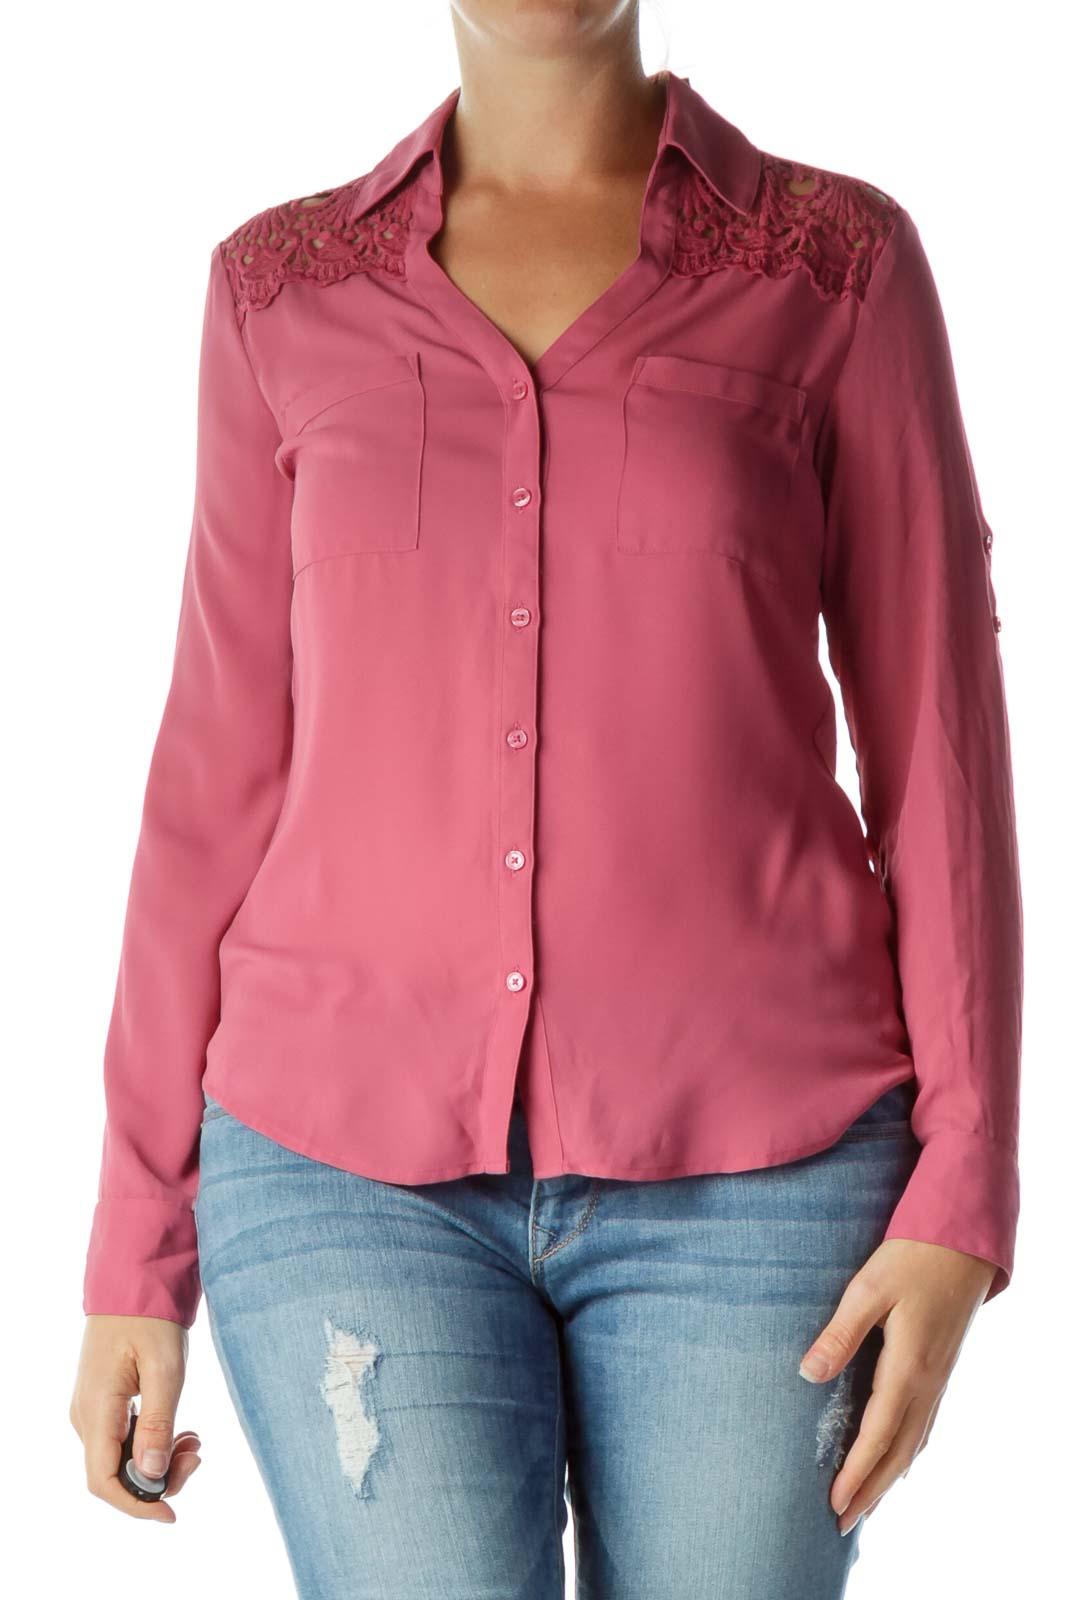 Pink Crocheted Back Shirt